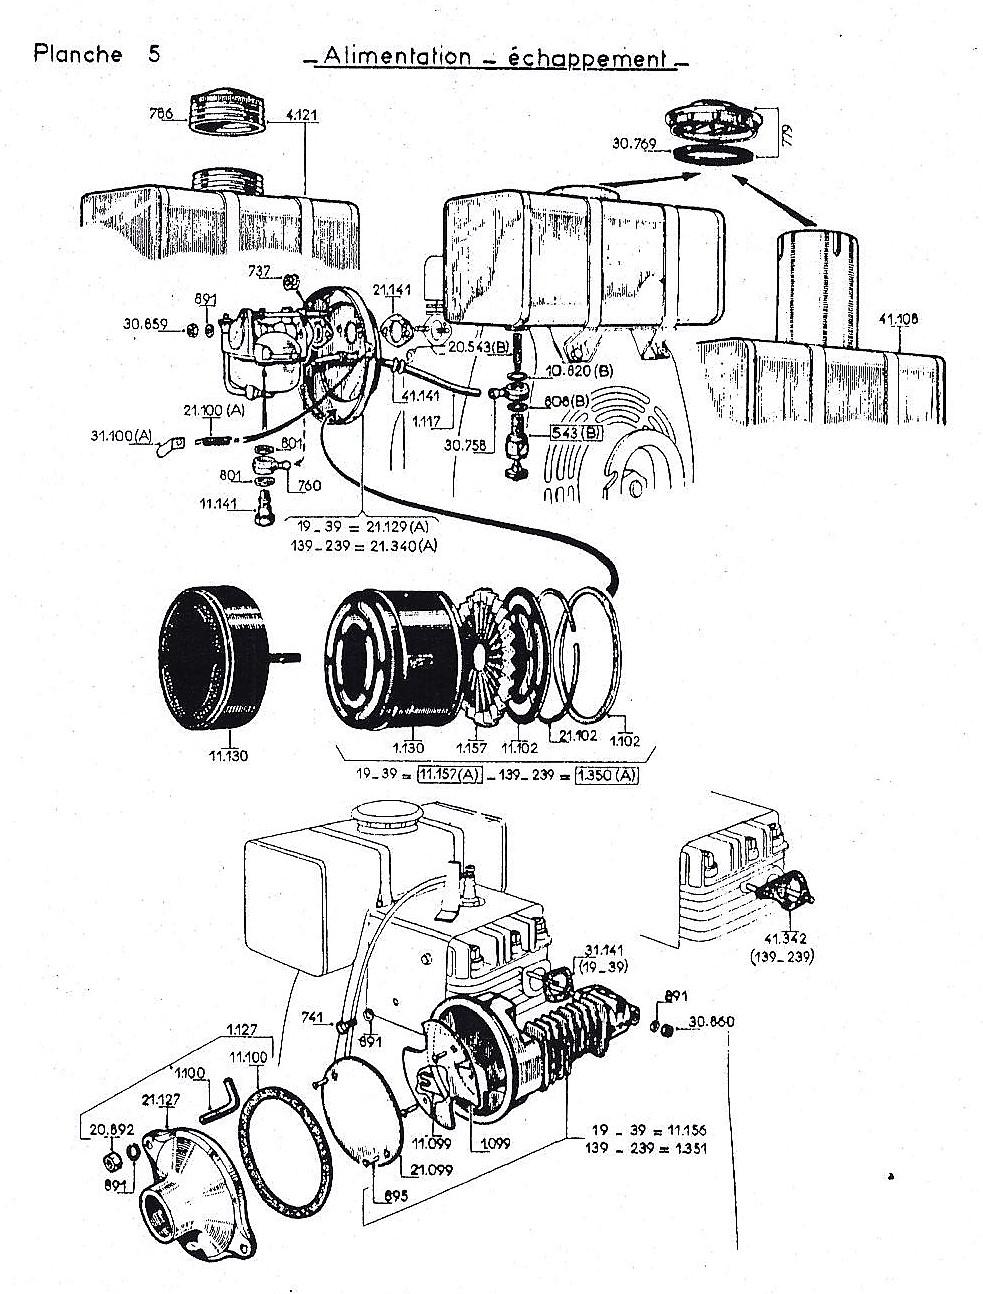 vue éclatée  alimentation echappement W19-W139-W239